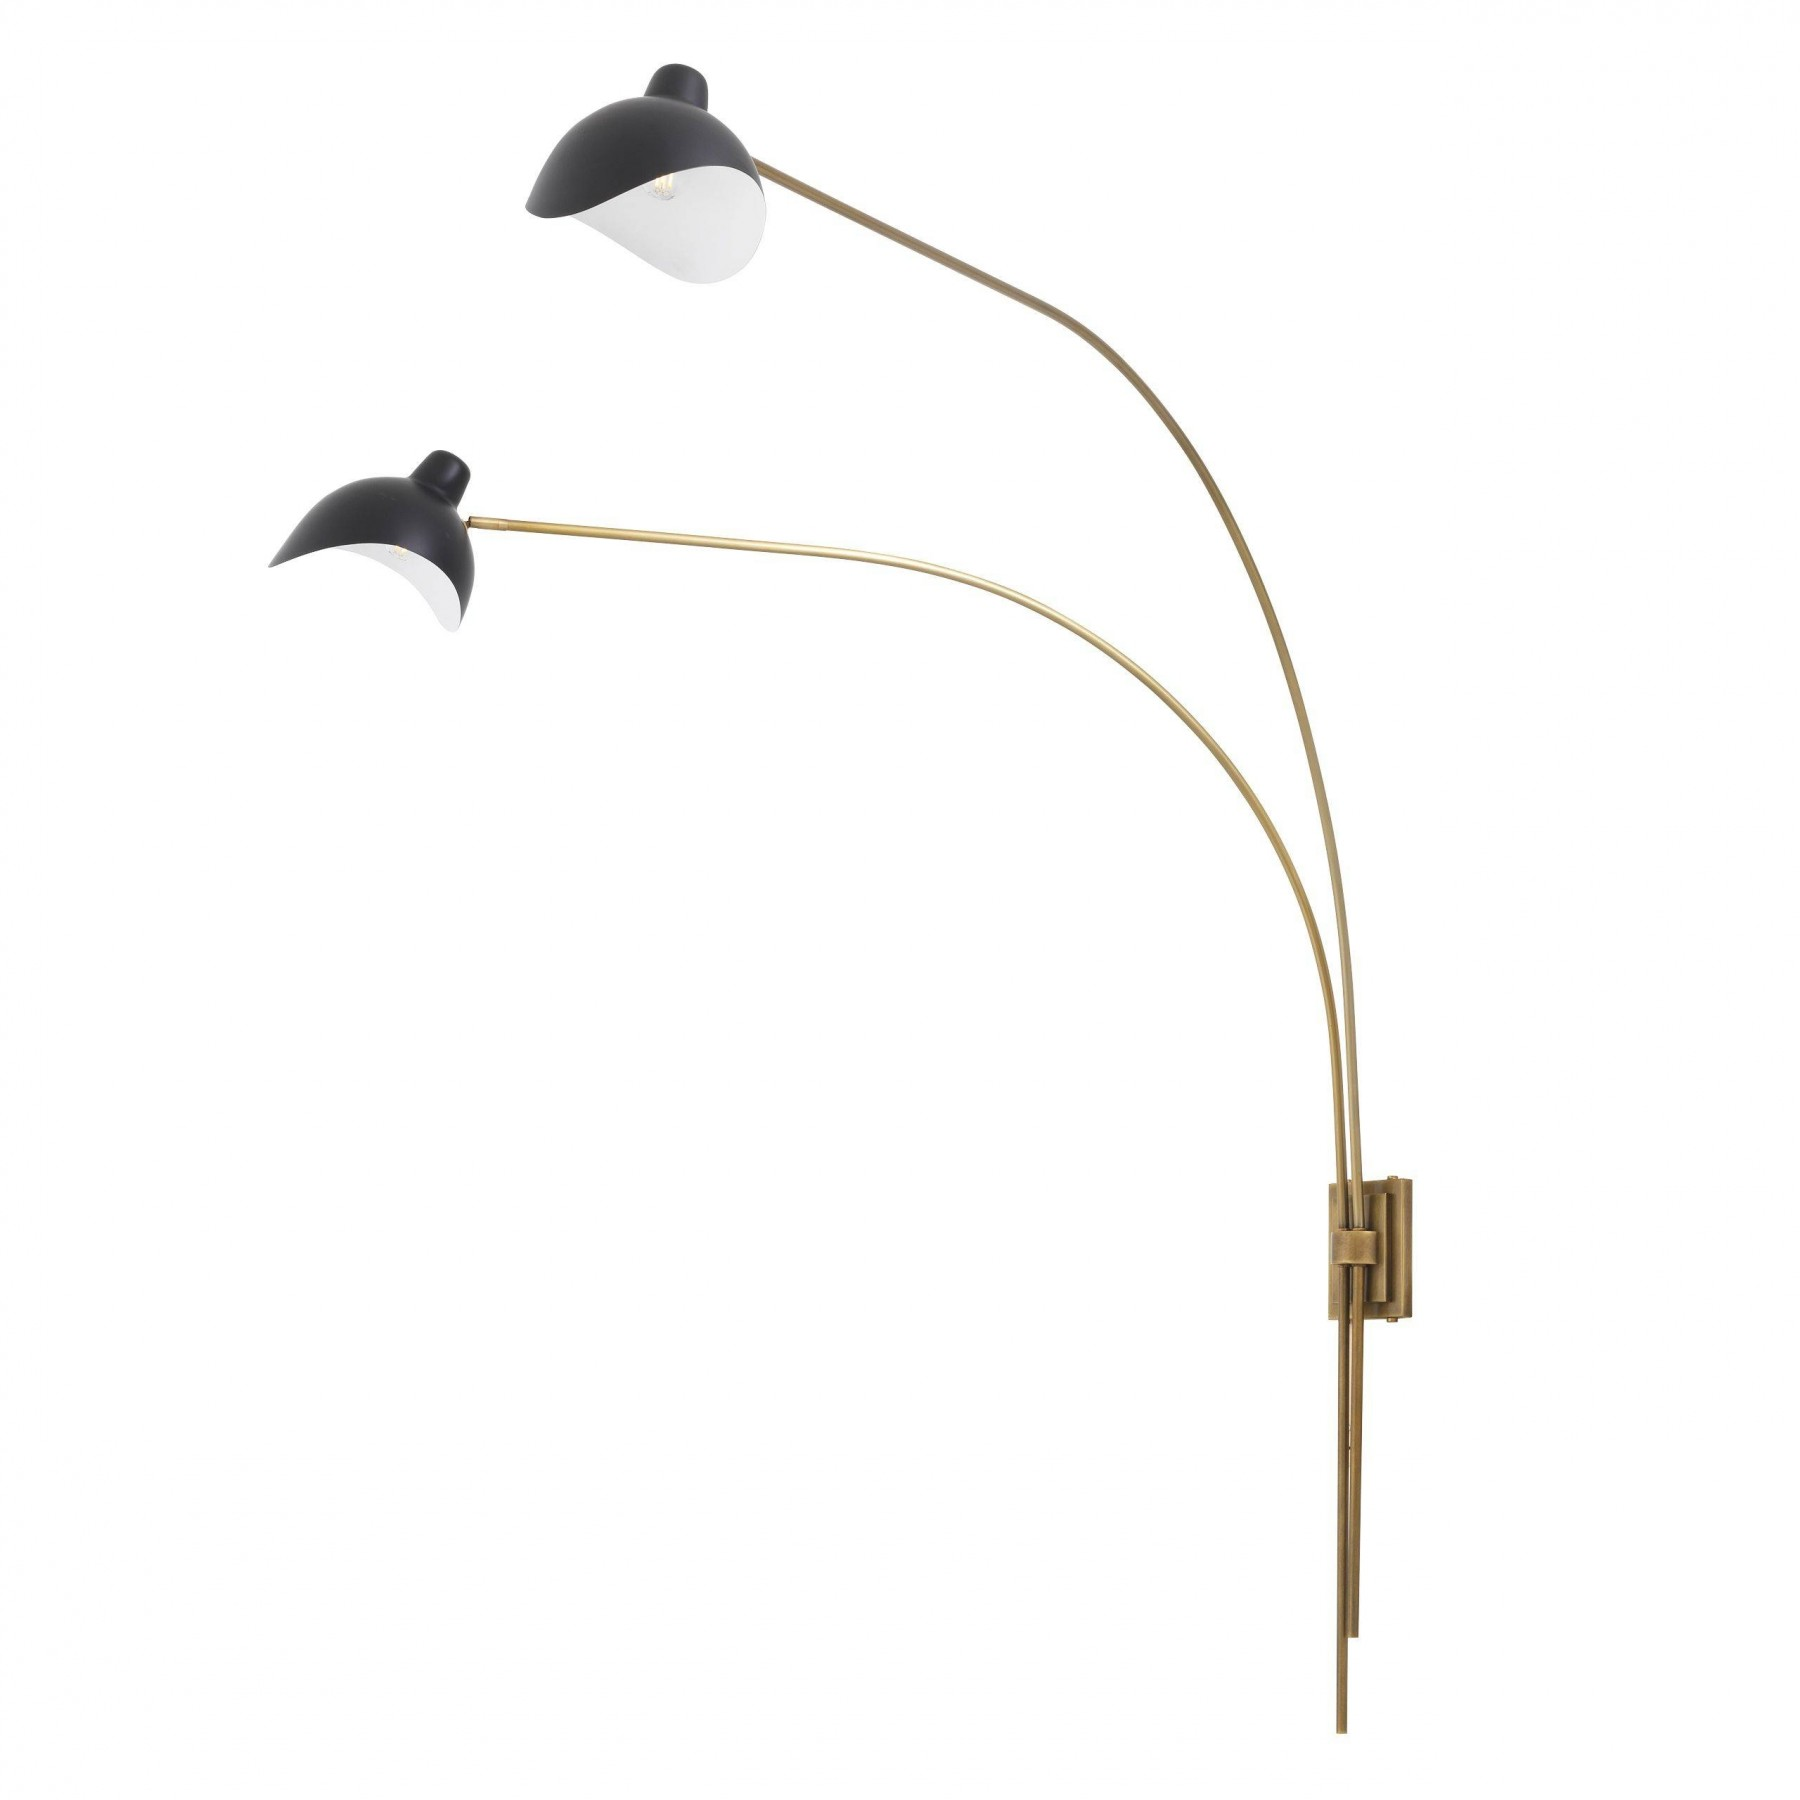 Mitch Antique Brass Wall Lamp | SHOP NOW